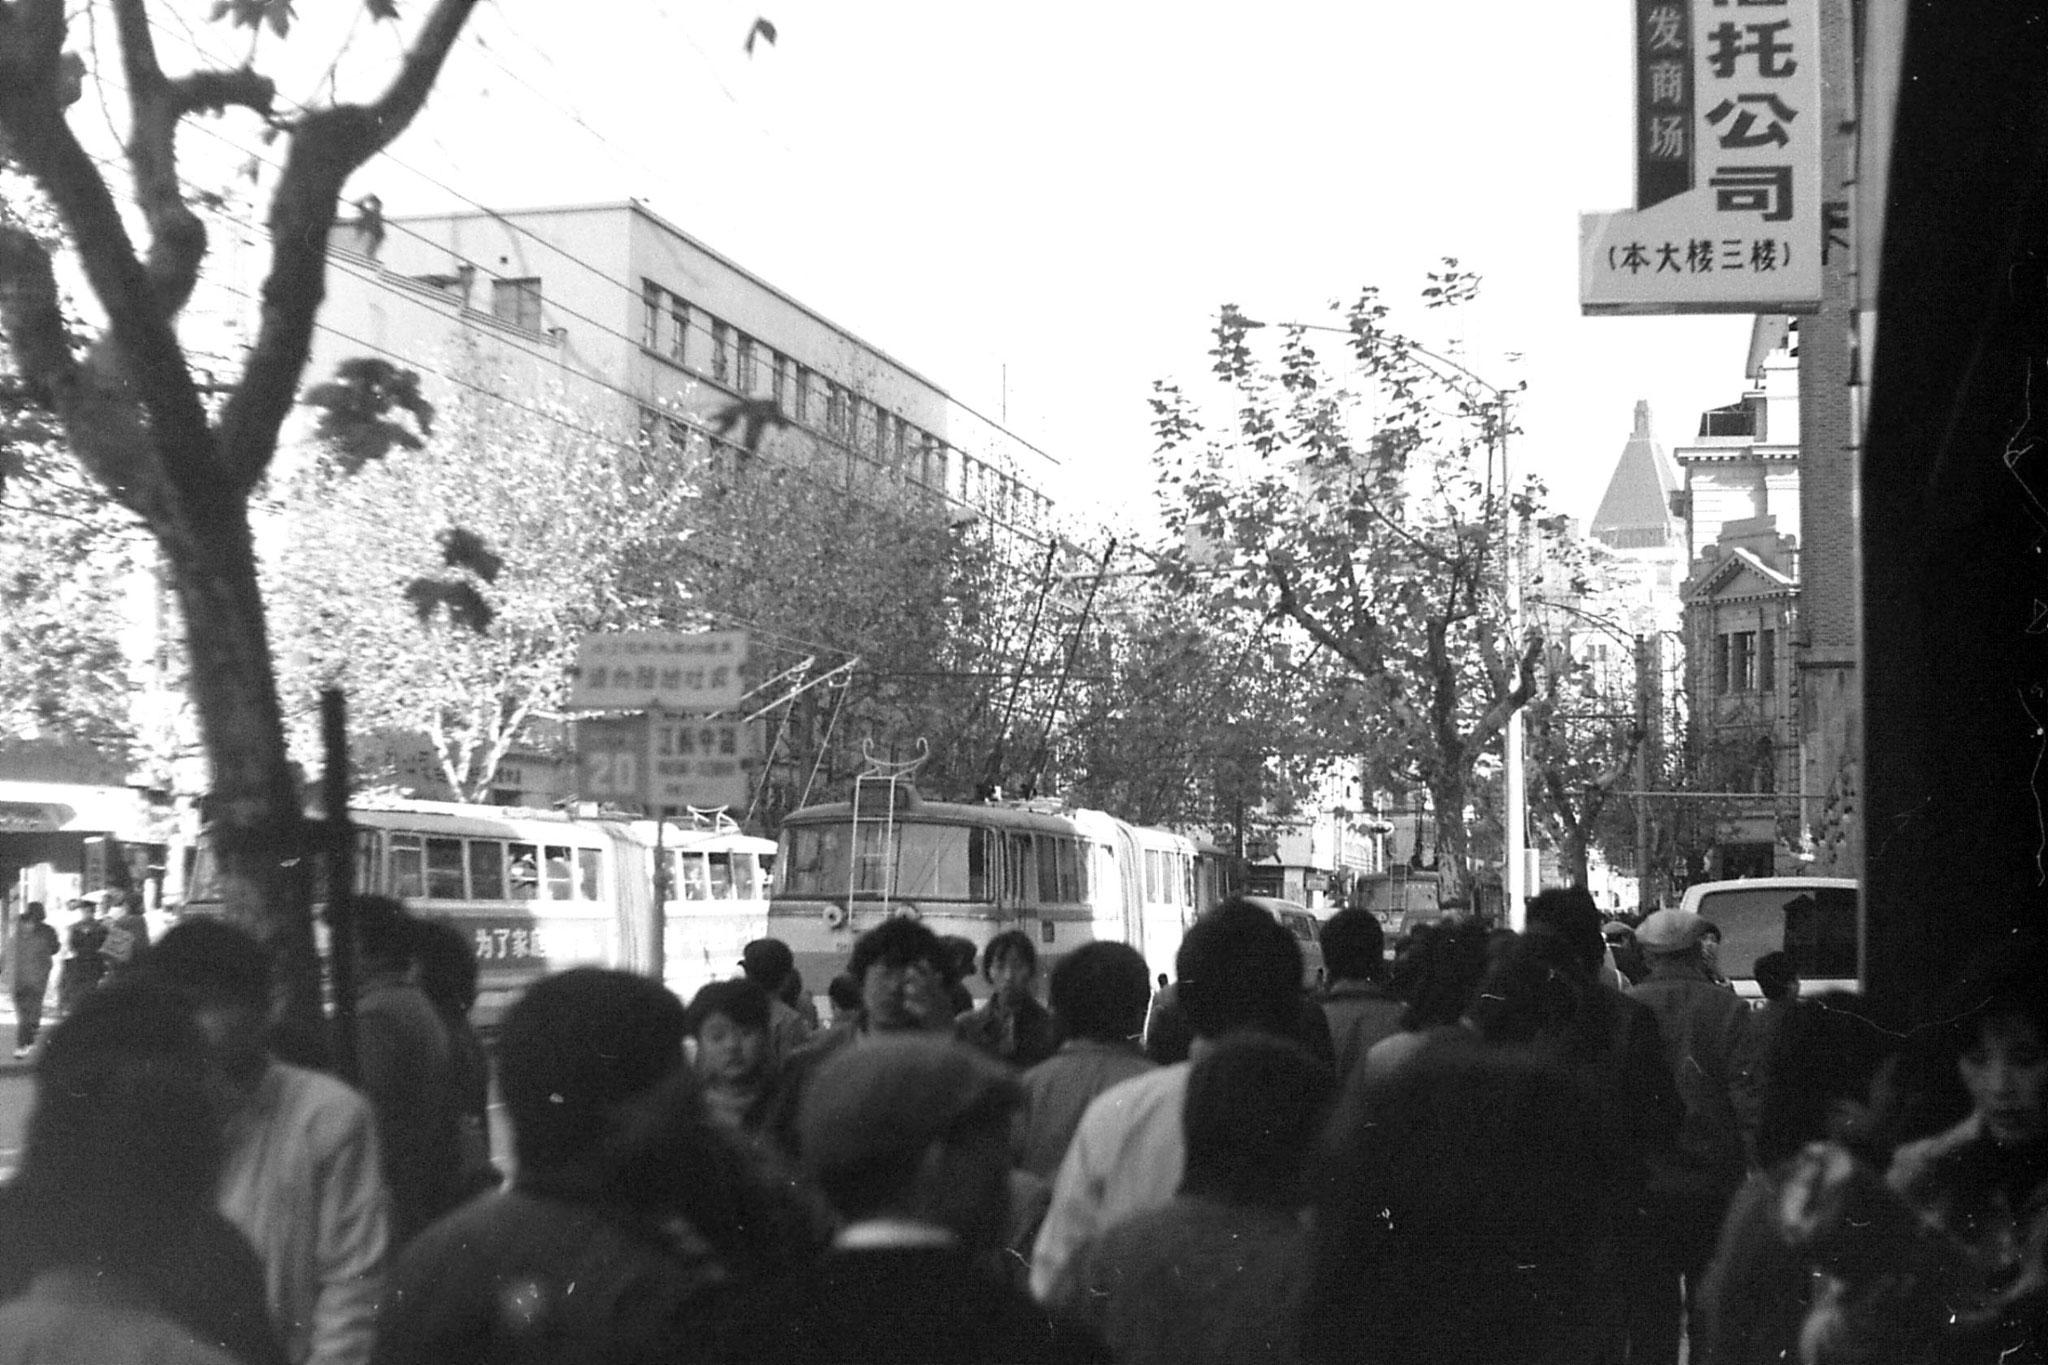 14/12/1988: 21: Shanghai, Peace Hotel from Nanjing Lu